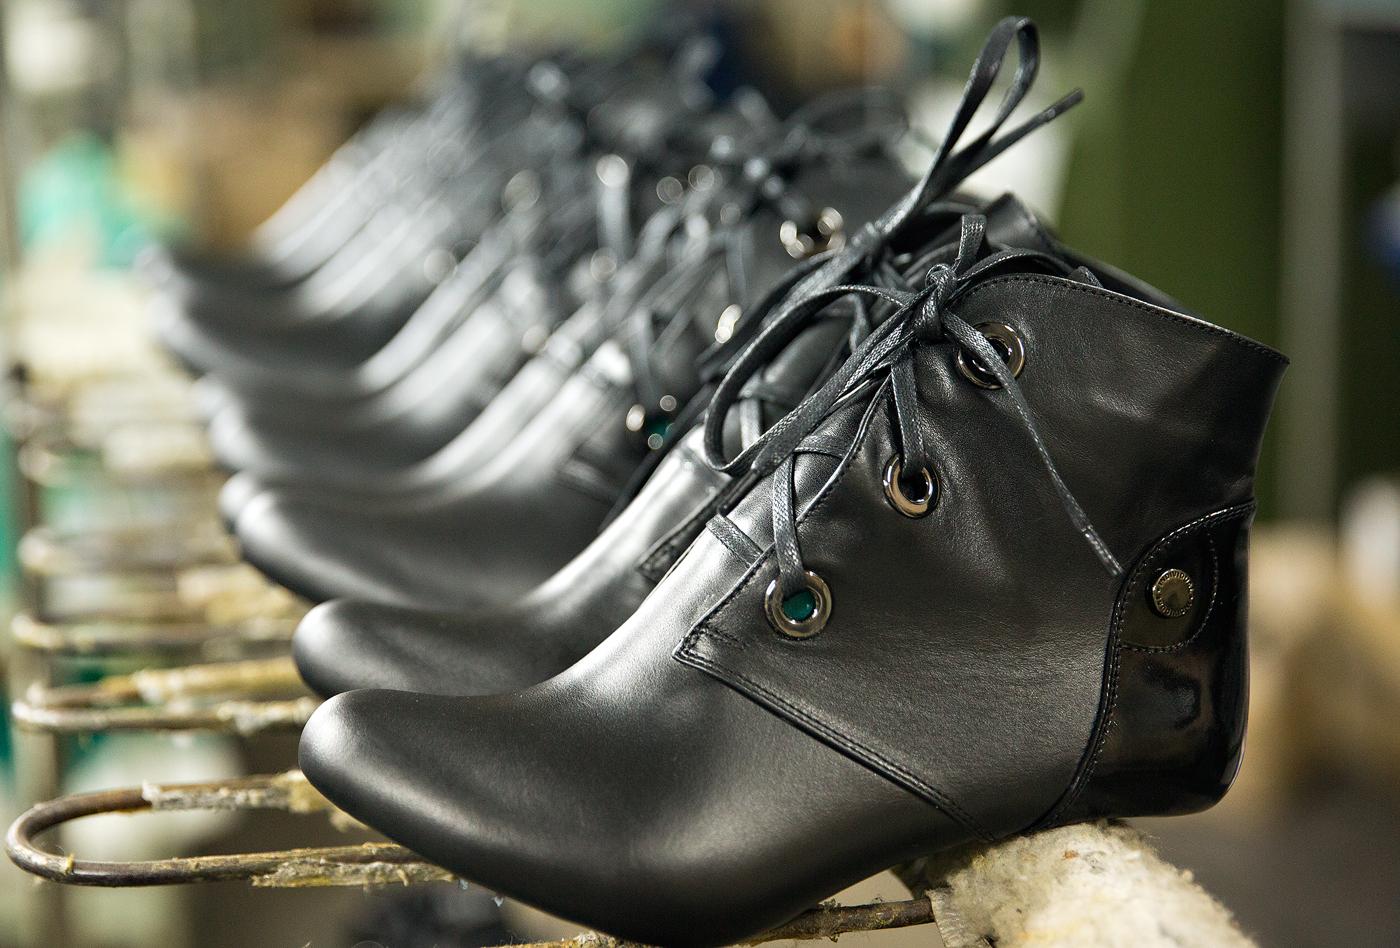 da52ffe81ced Днепропетровская обувная фабрика POLI - Производство и продажа ...